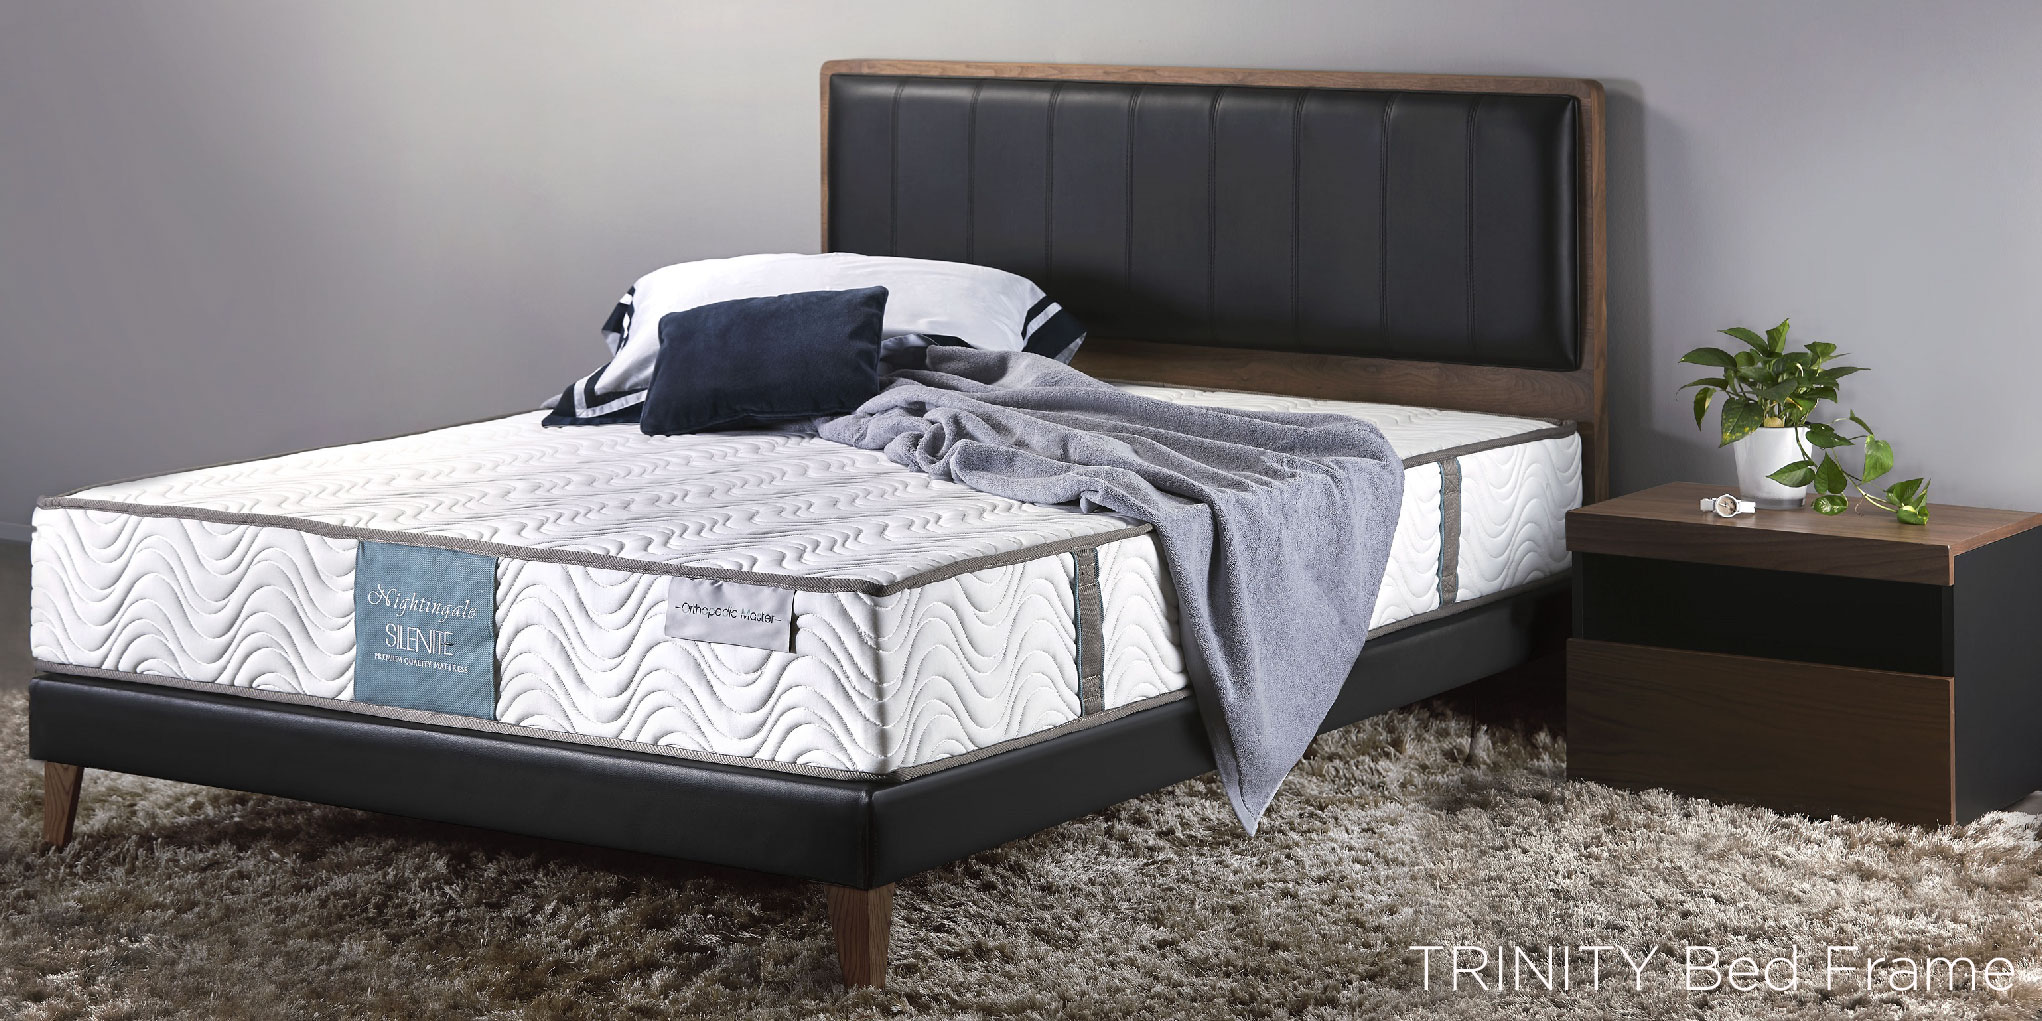 Trinity bed frame 01